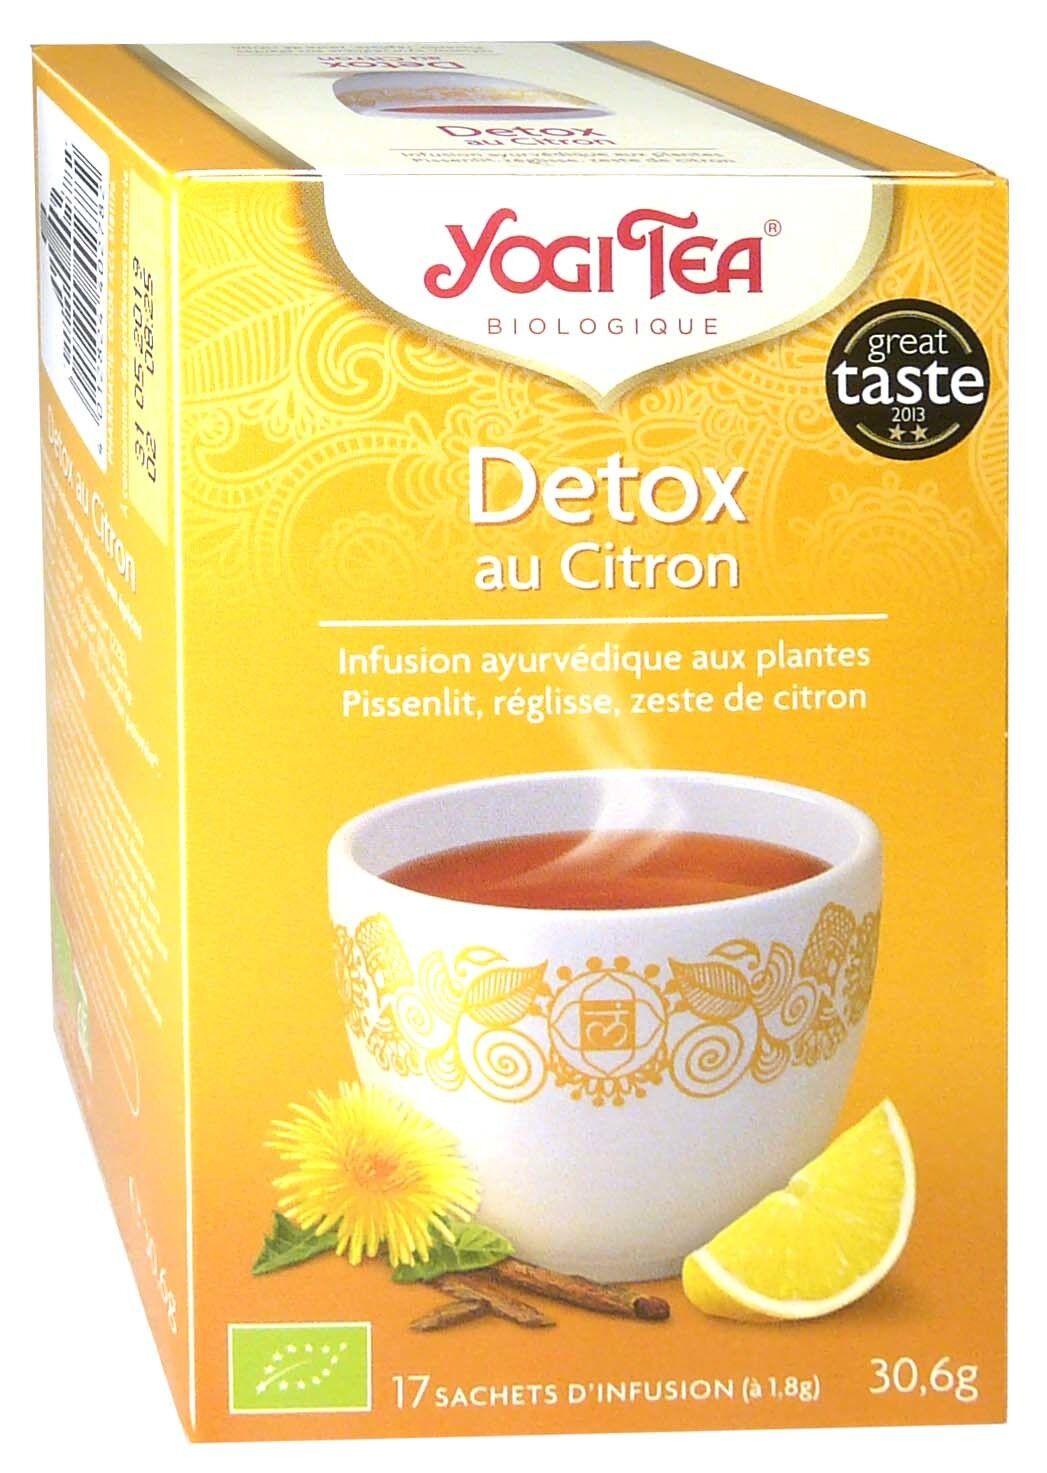 Yogi tea infusion detox au citron x17 sachets